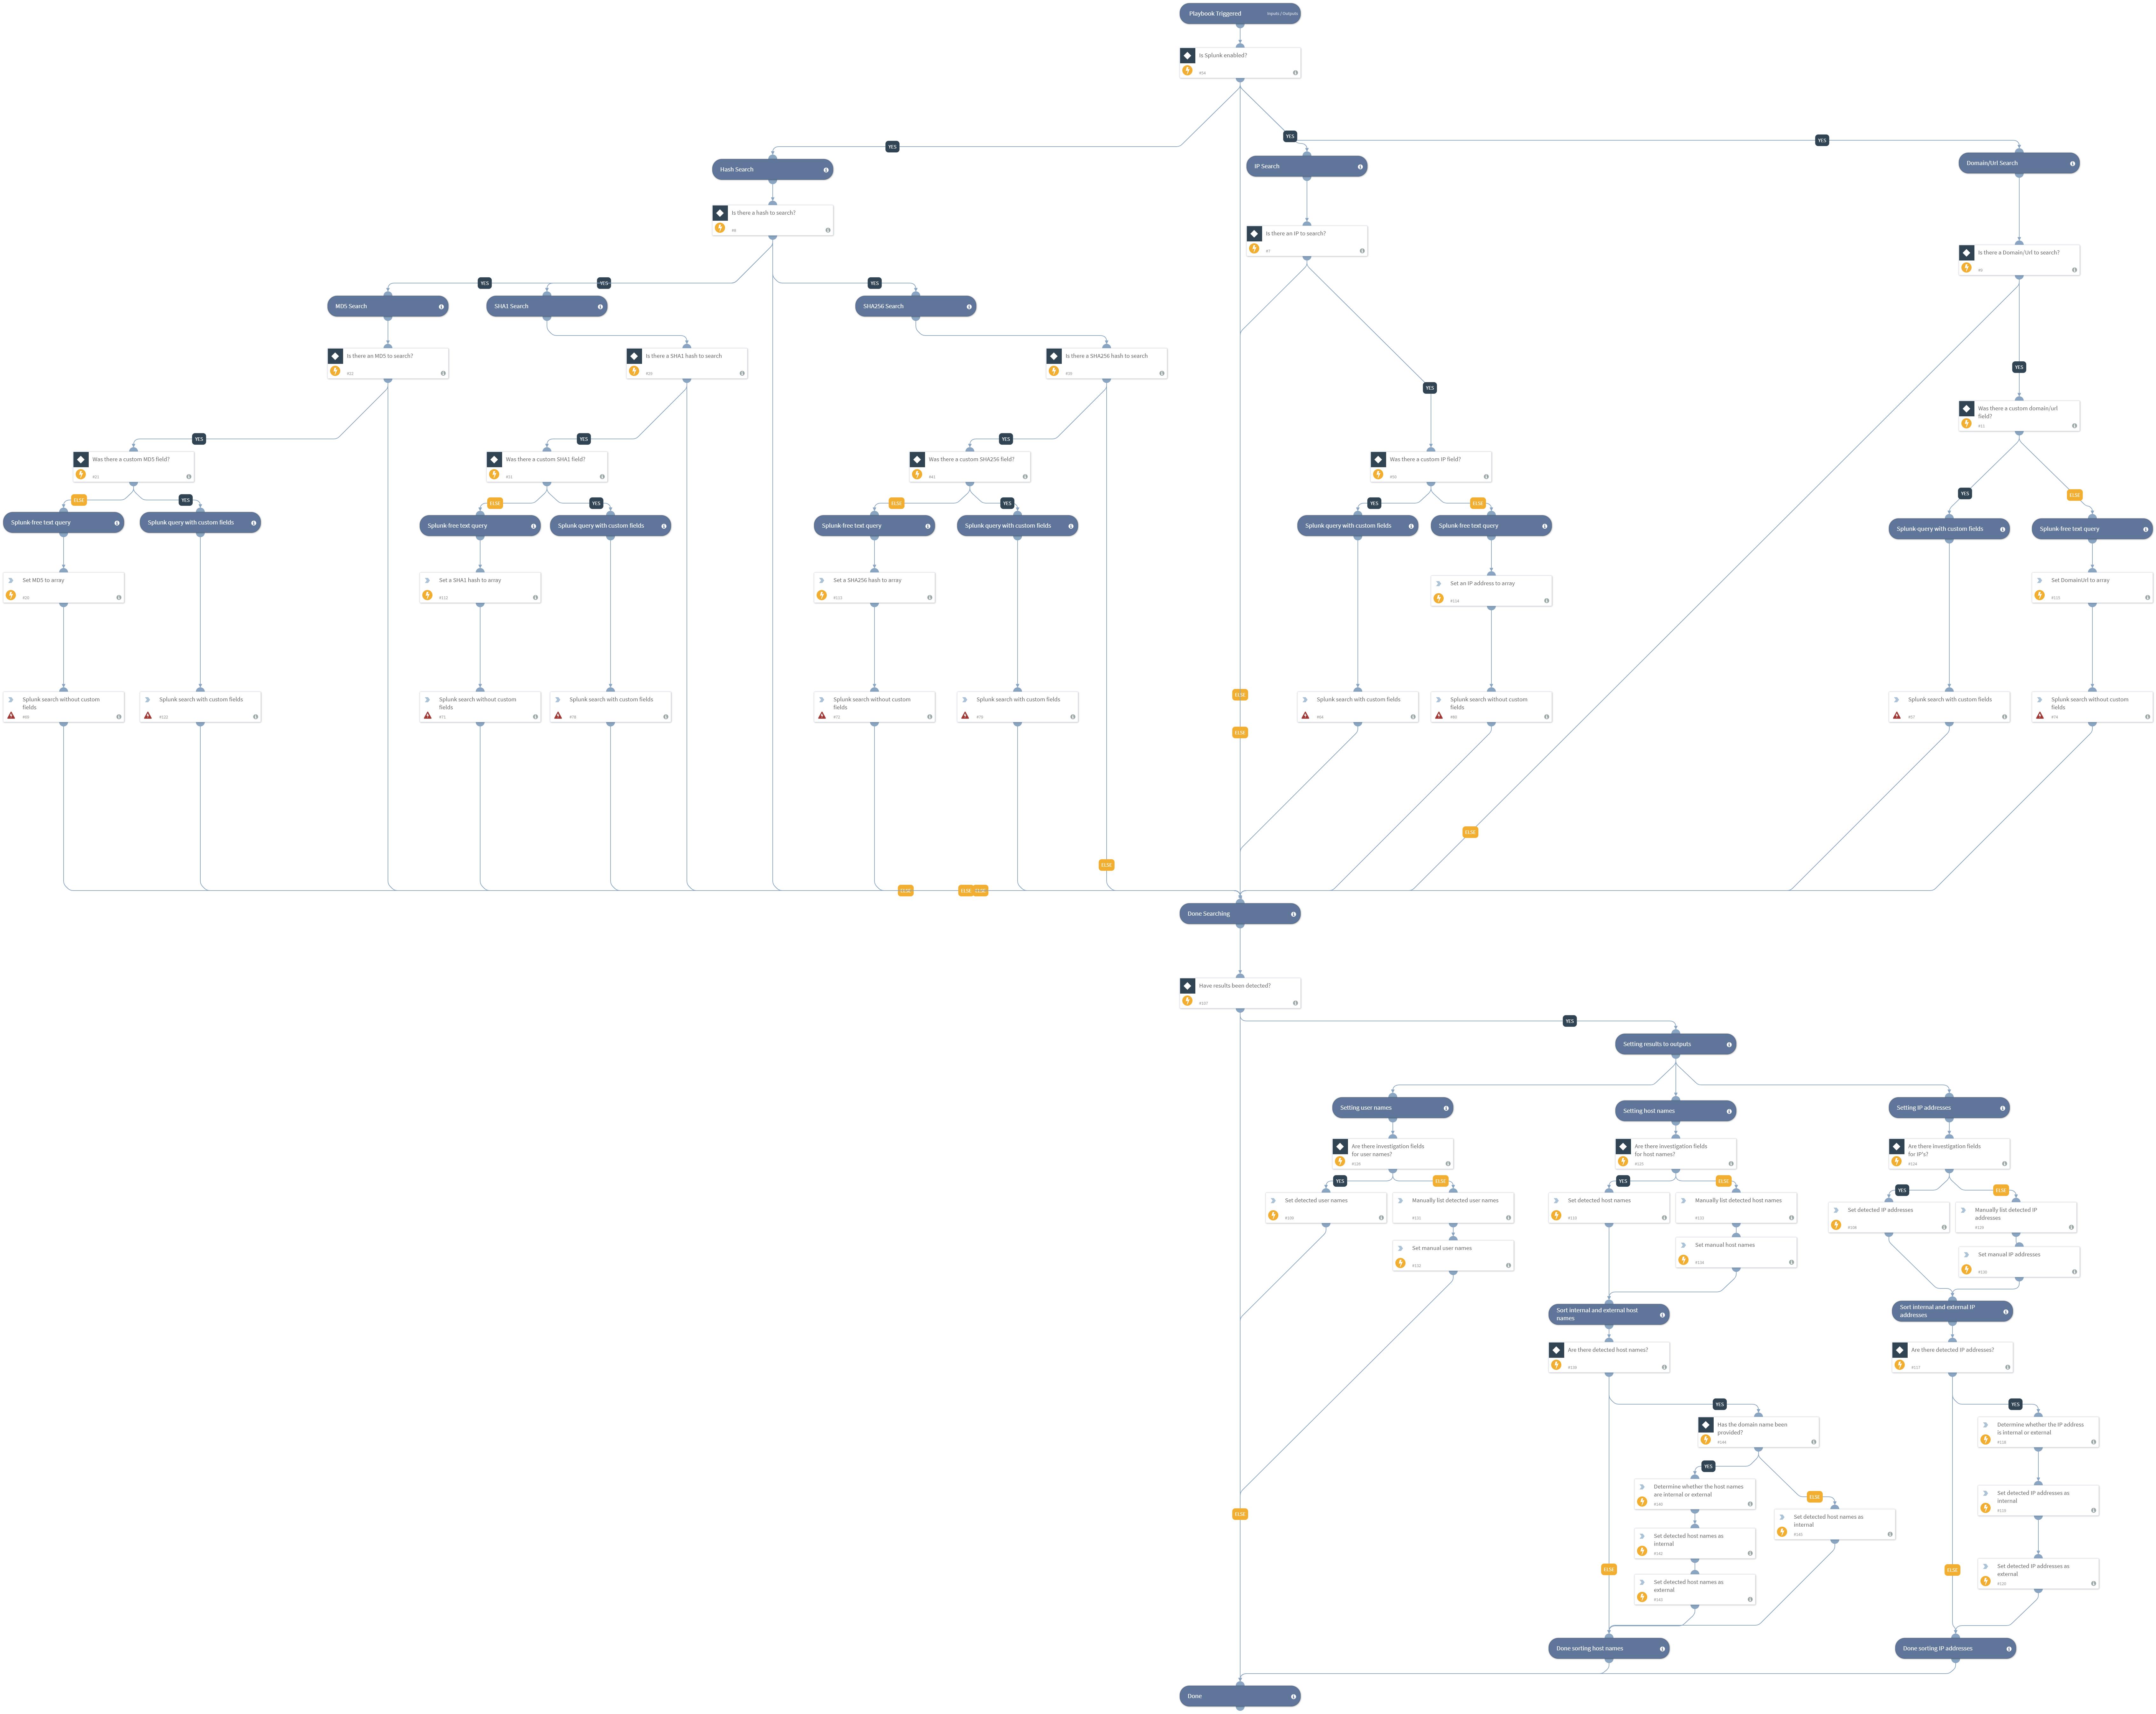 Splunk_Indicator_Hunting